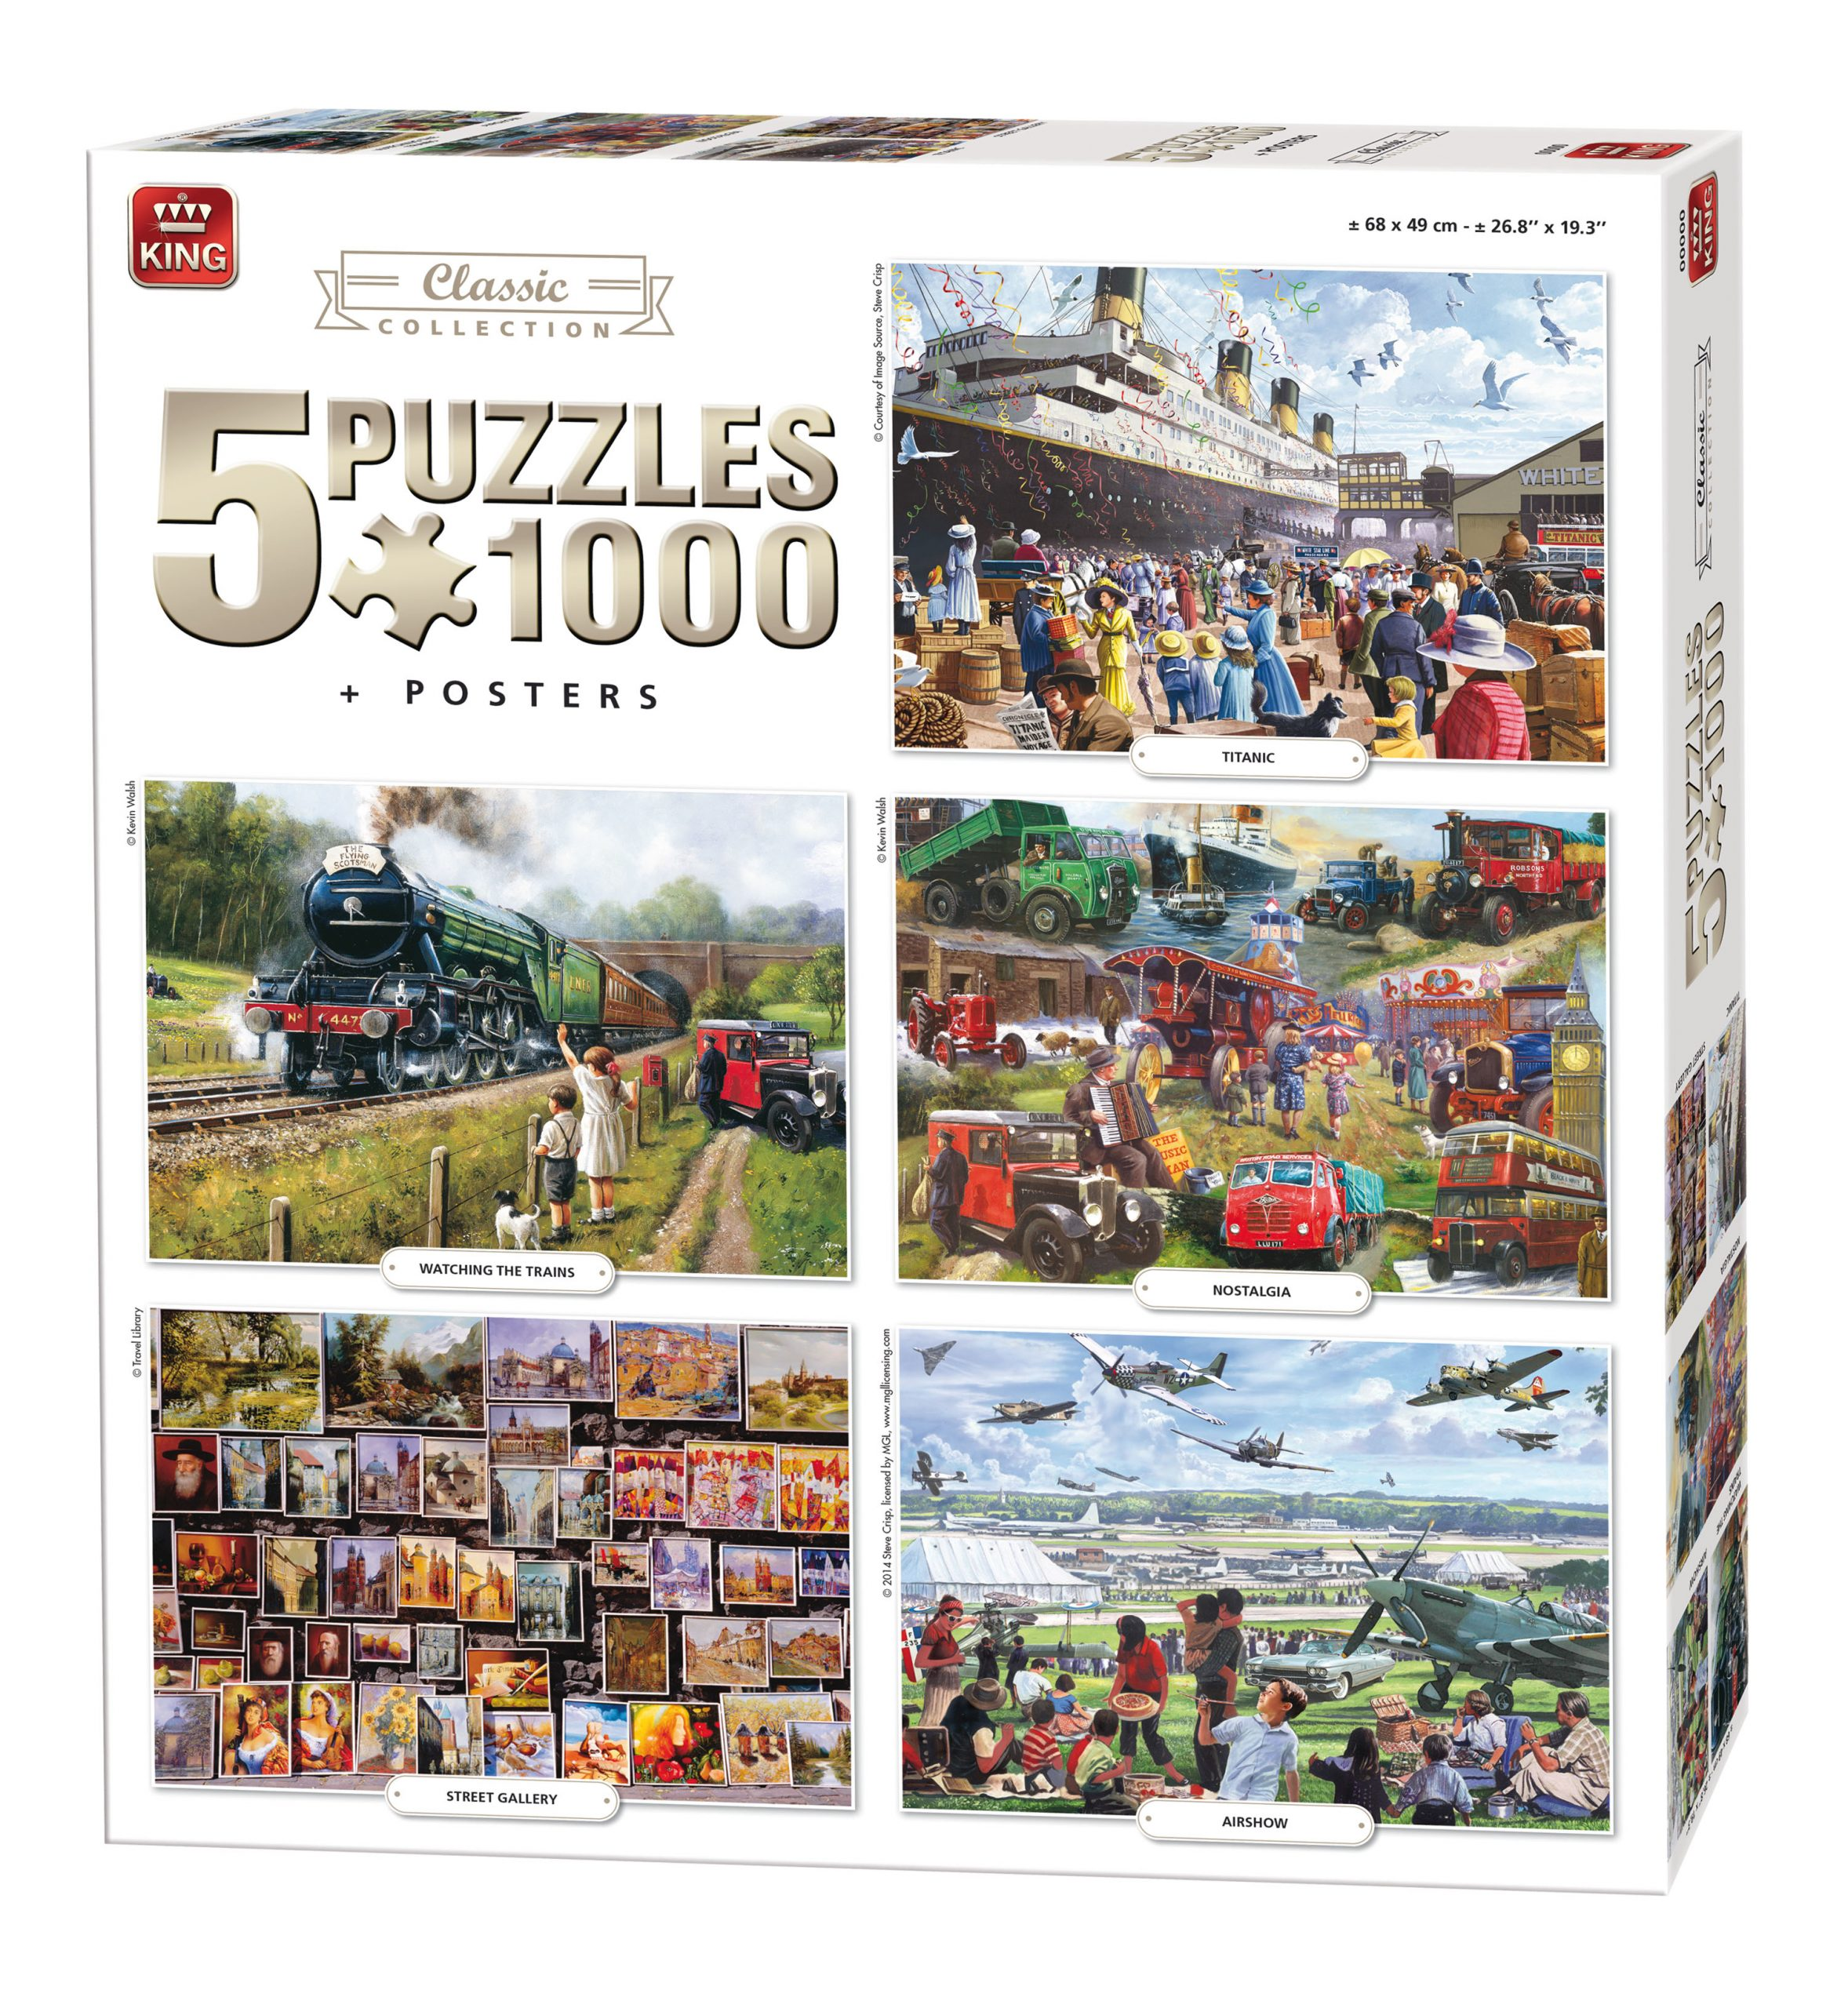 Puzzle King Pack 5 puzzles Imagenes Clasicas 1000 piezas + 5 posters